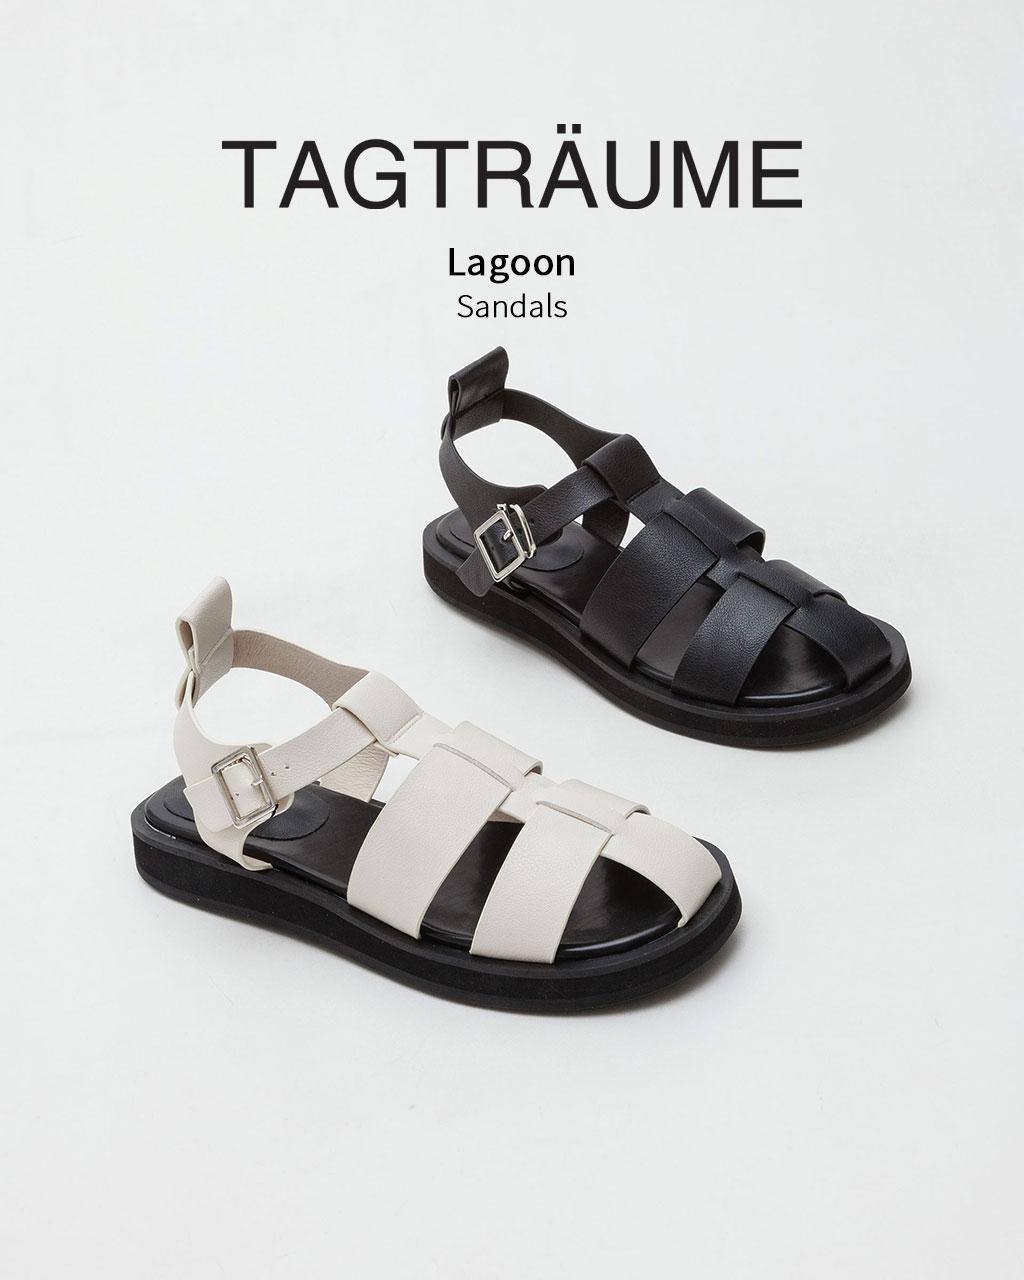 Tagtraume Lagoon - 0